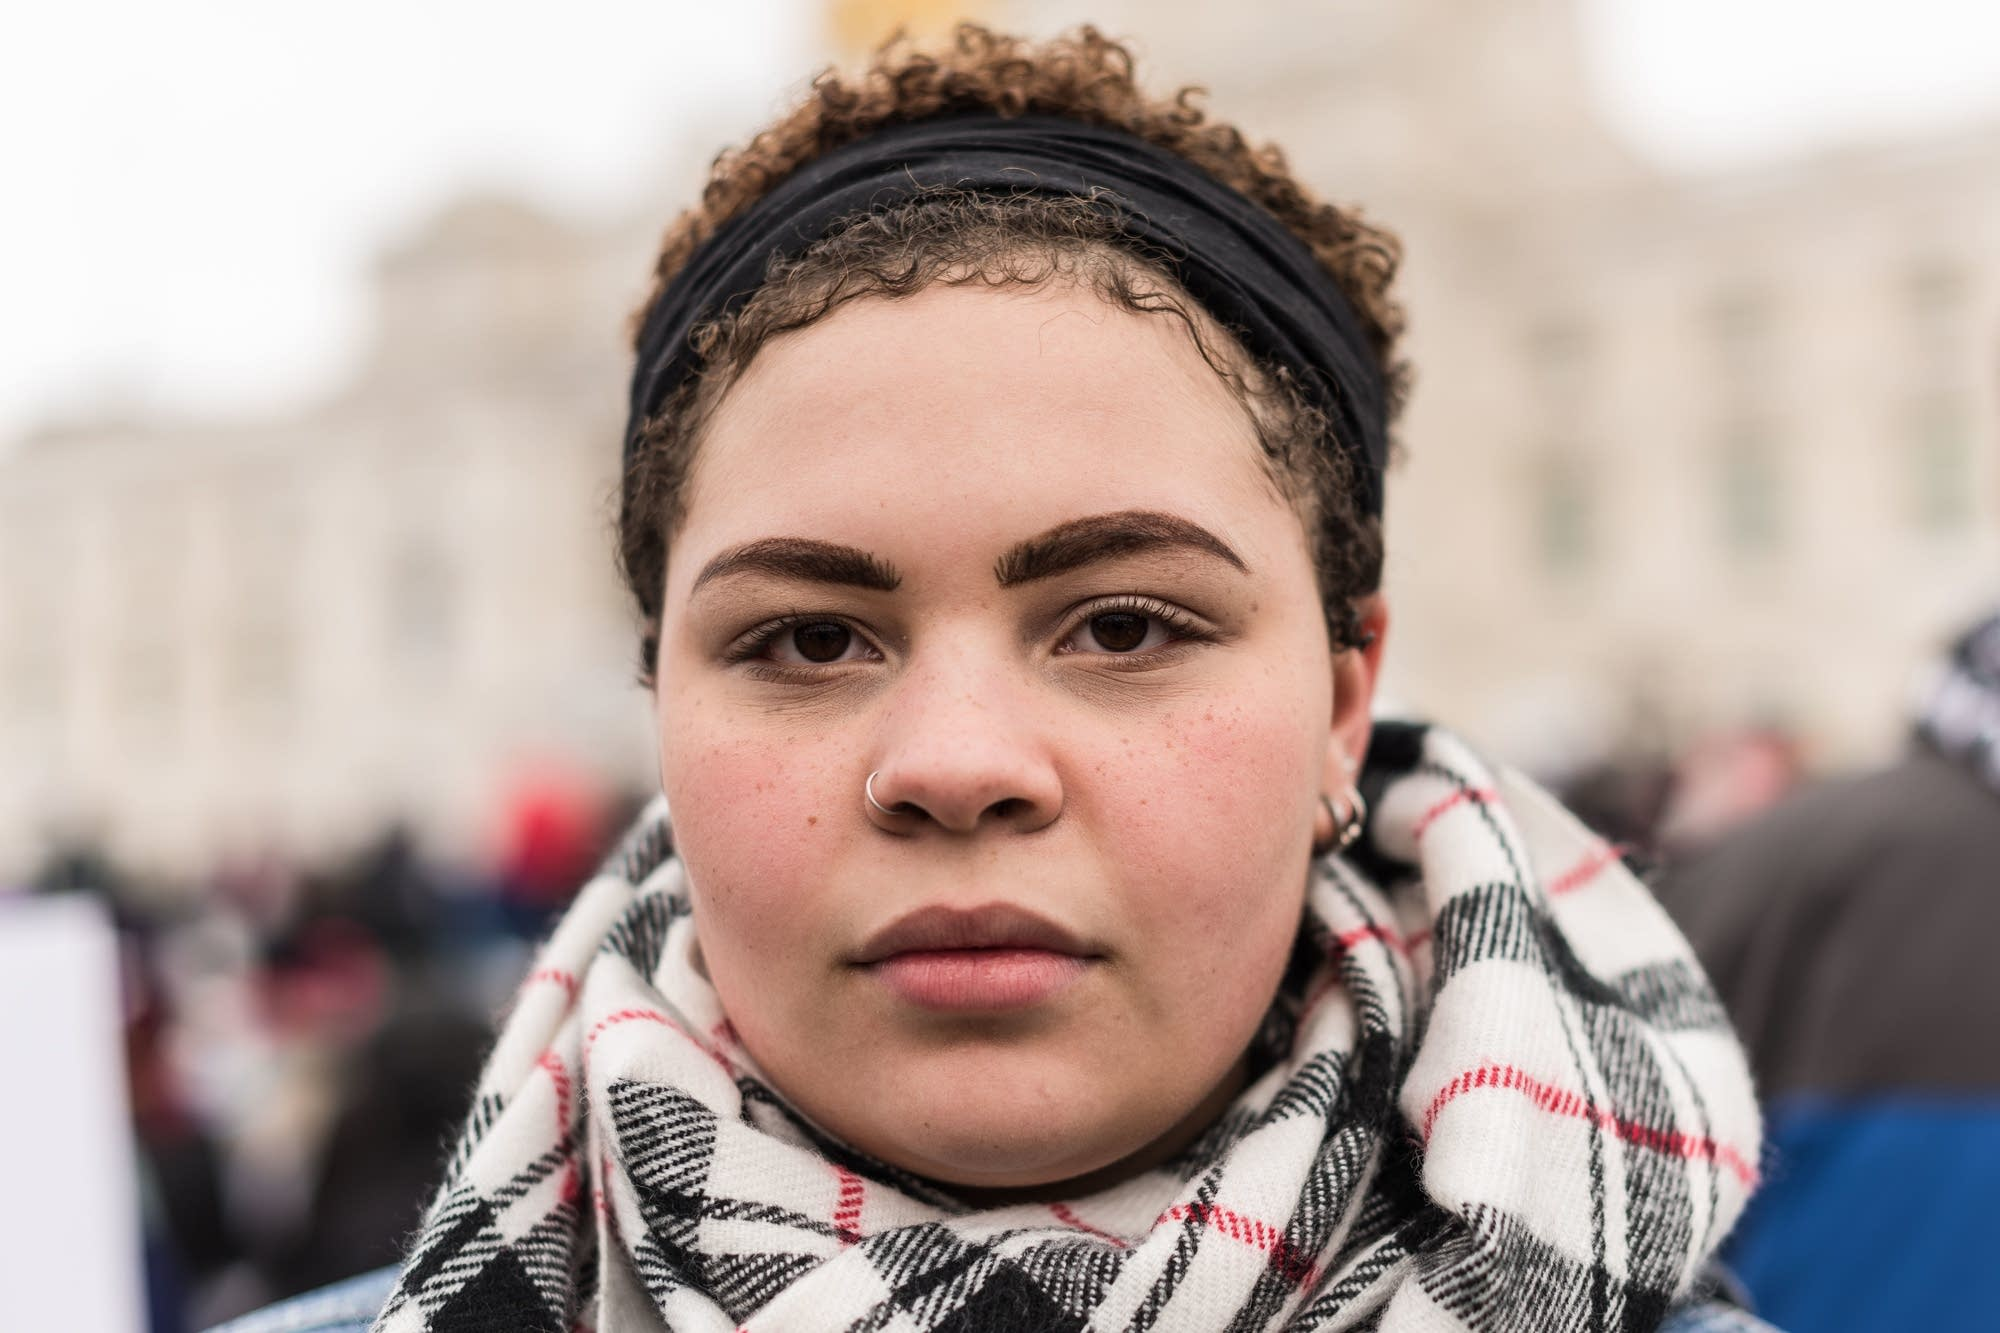 Jazmin Weidell, 18, from Woodbury High School